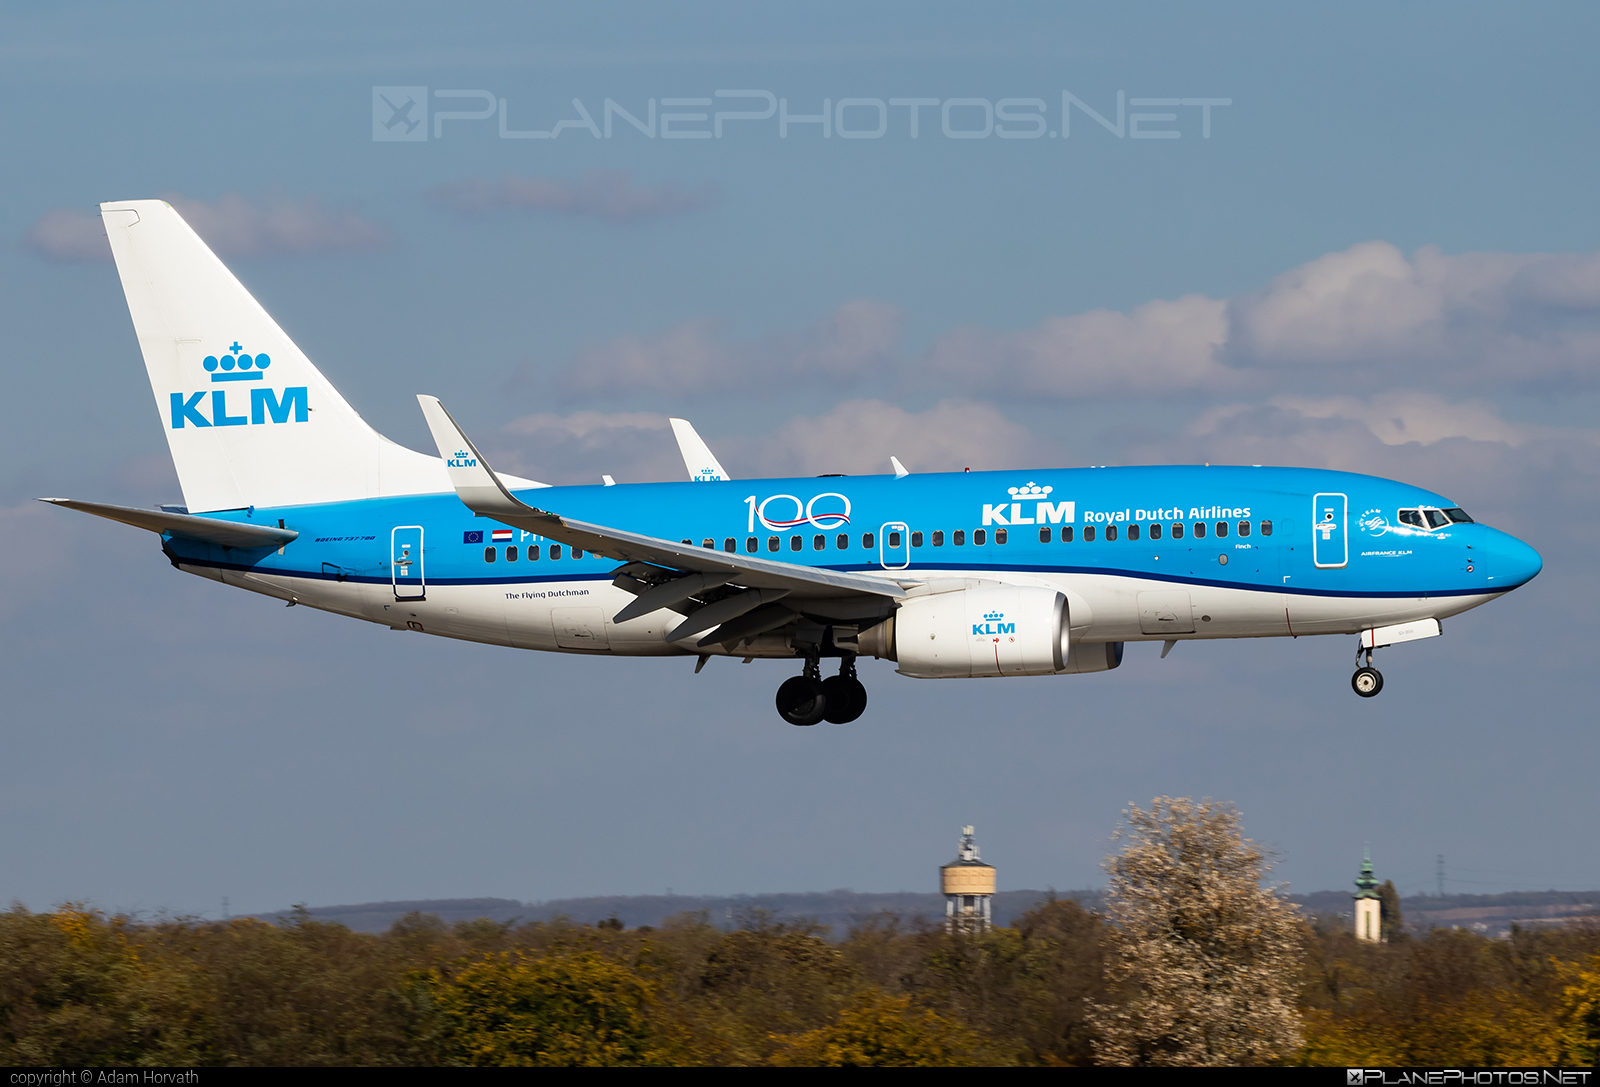 Boeing 737-700 - PH-BGI operated by KLM Royal Dutch Airlines #b737 #b737nextgen #b737ng #boeing #boeing737 #klm #klmroyaldutchairlines #royaldutchairlines